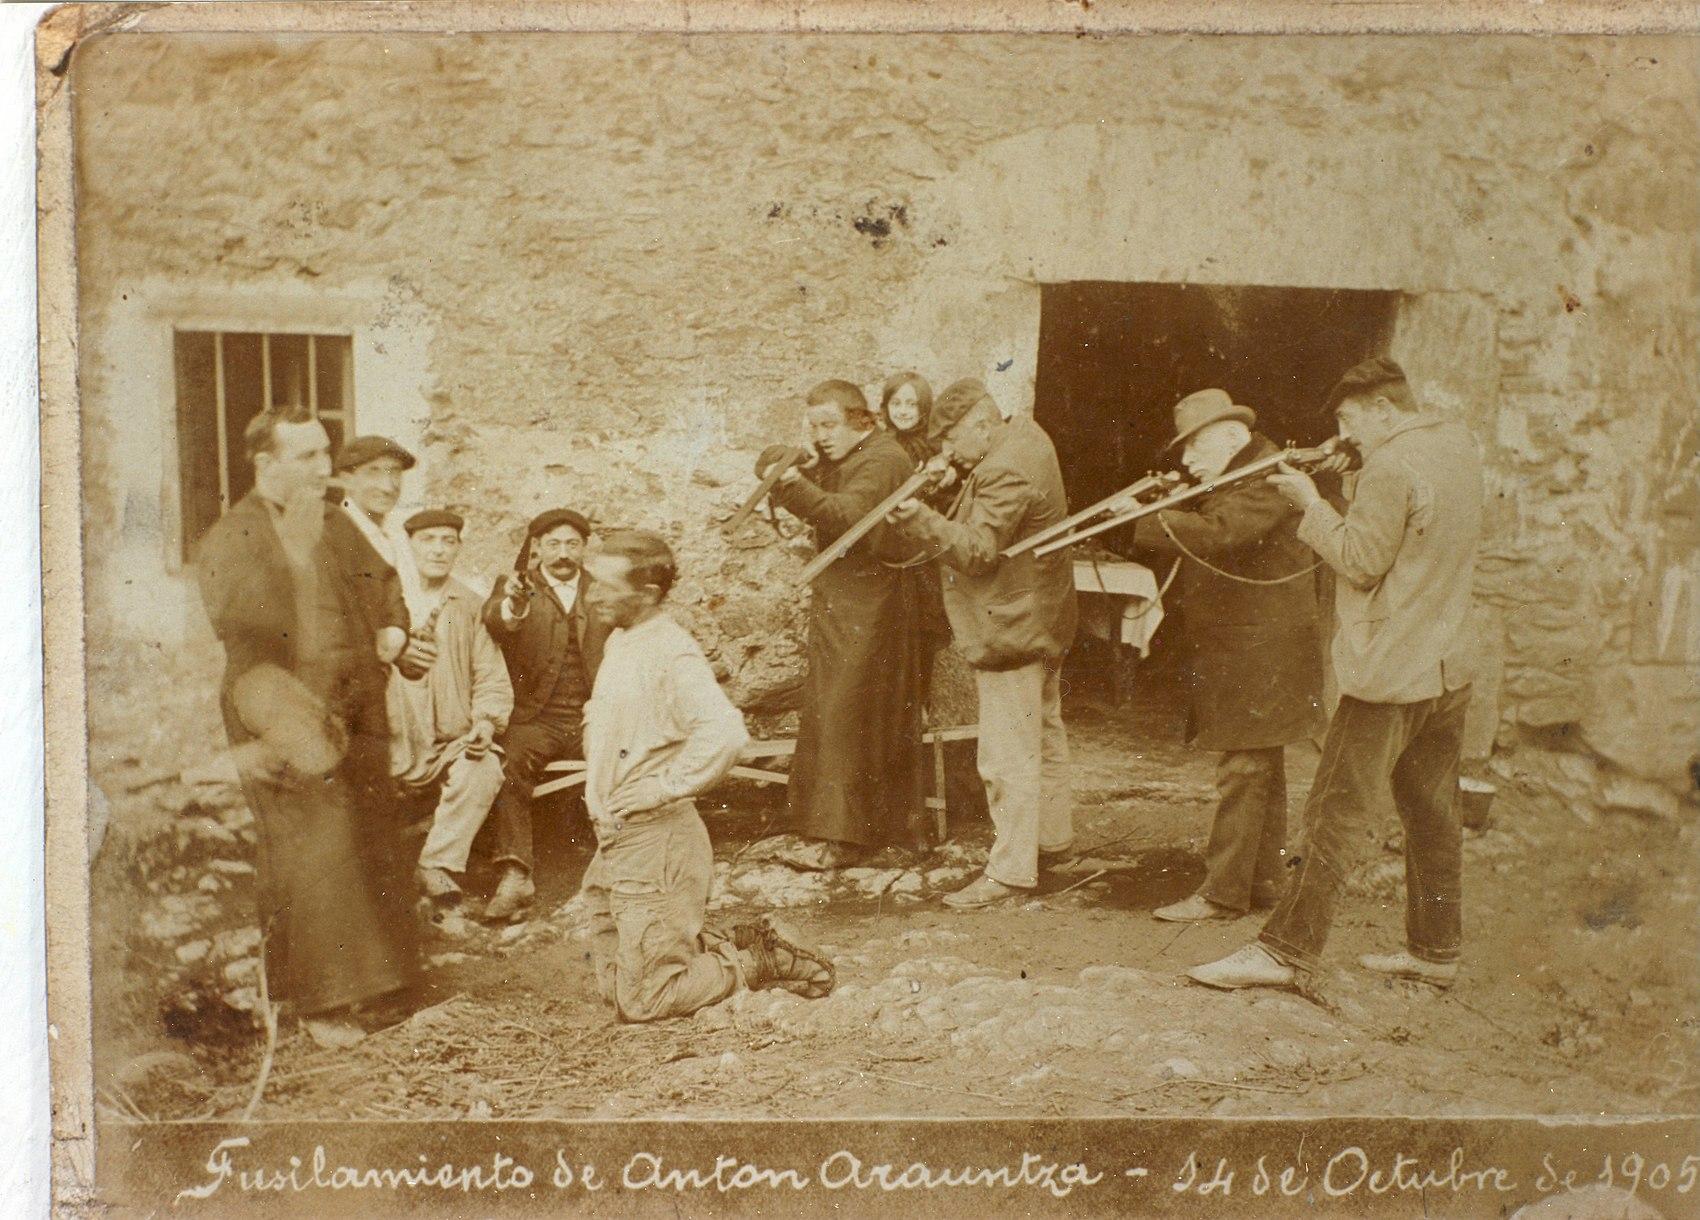 Anton arauntza fusilamendua 1905.jpg